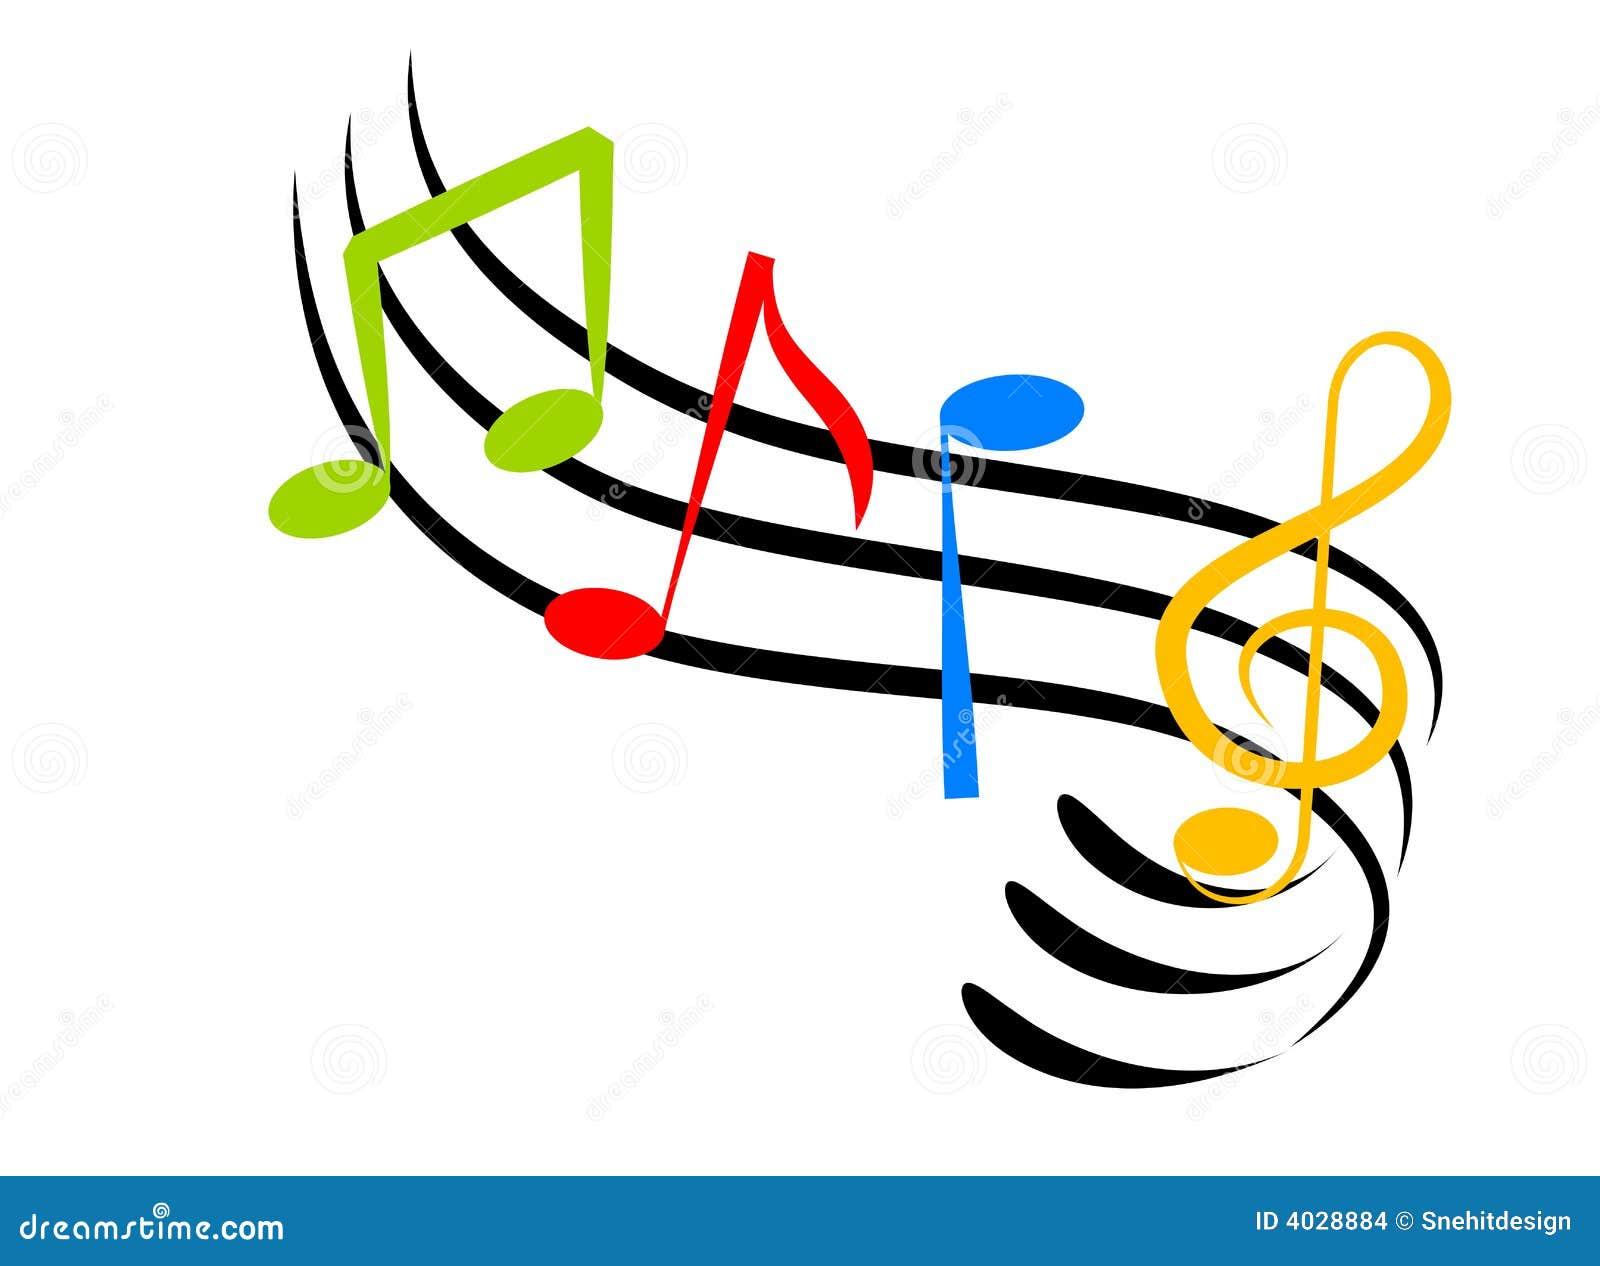 music notes stock illustration illustration of stationary free clipart piano keys free piano clipart illustrations